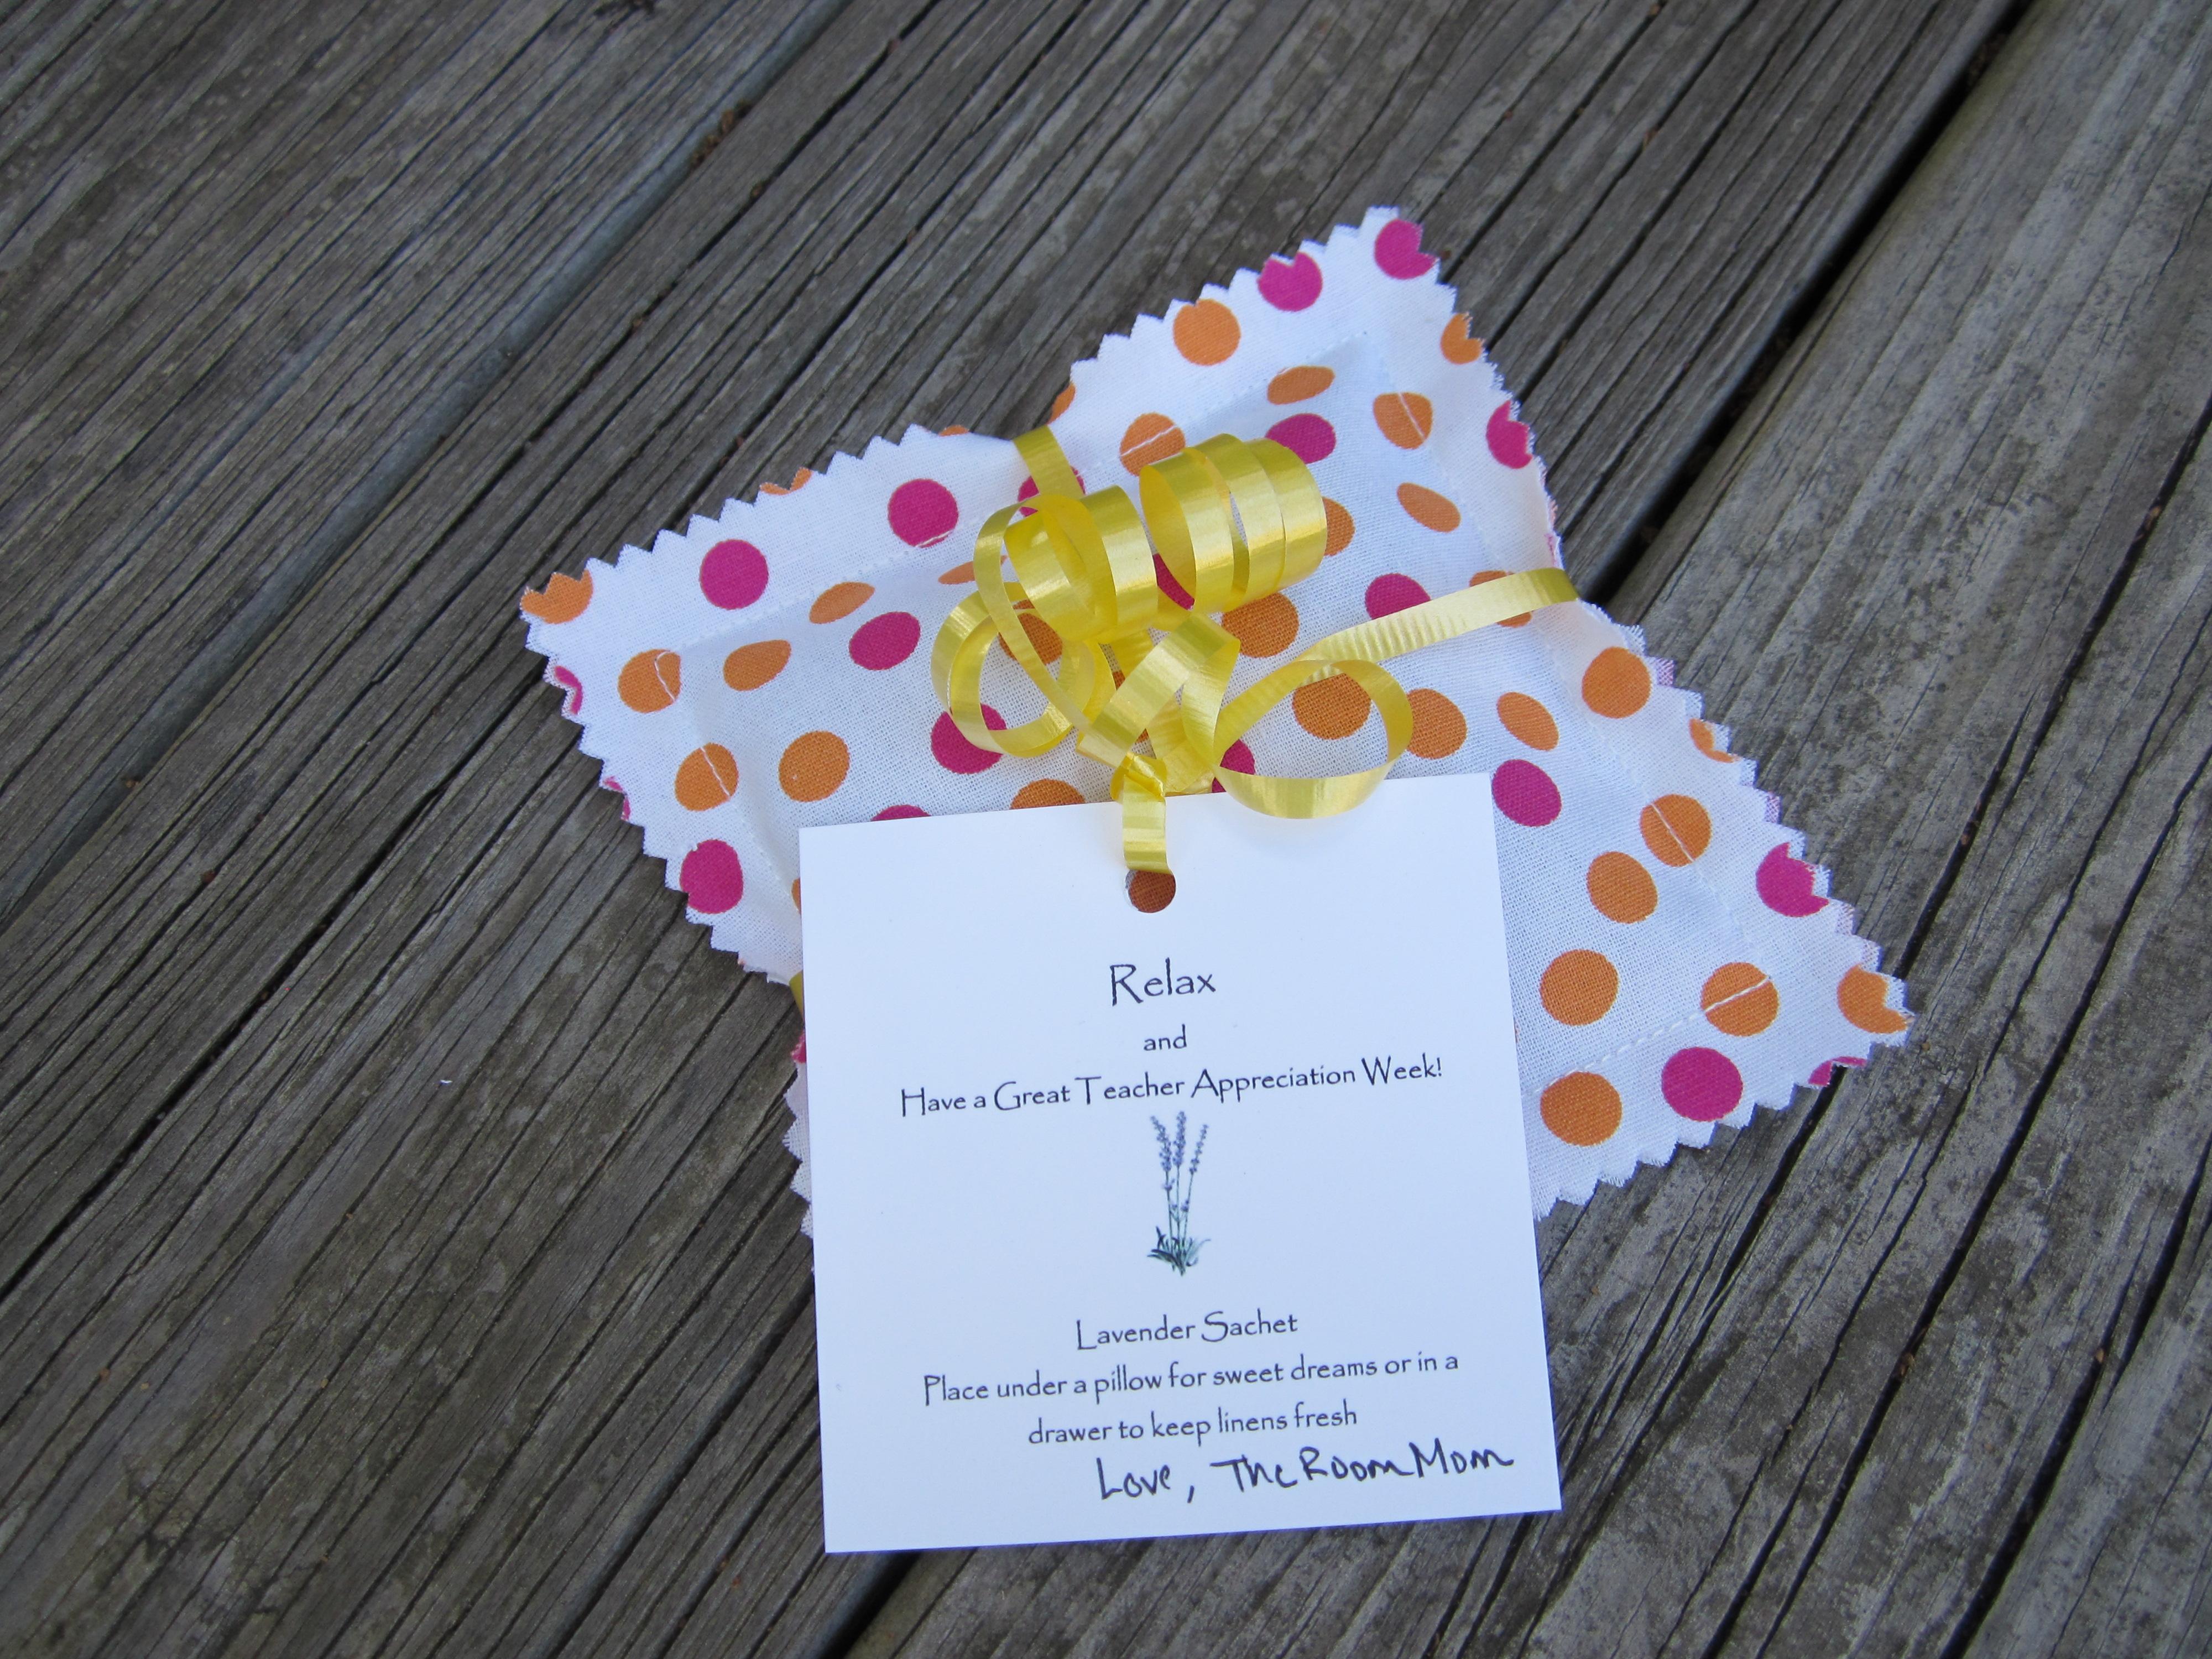 Teacher Appreciation Week Gift | TheRoomMom